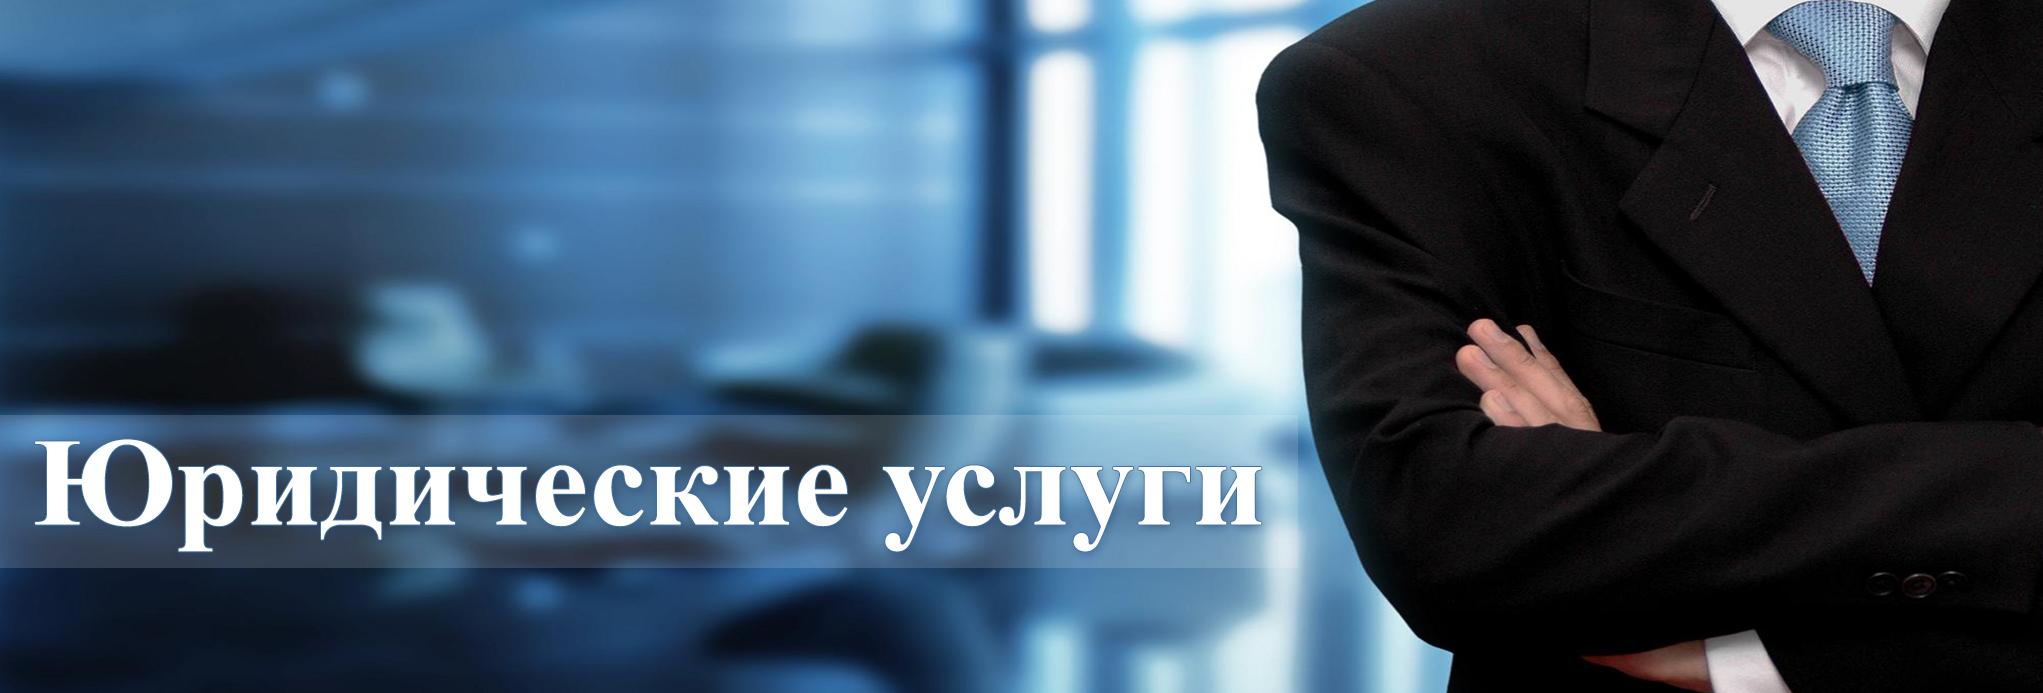 Бухгалтерско-консультационное бюро «Авантаж» от CofranceSARL